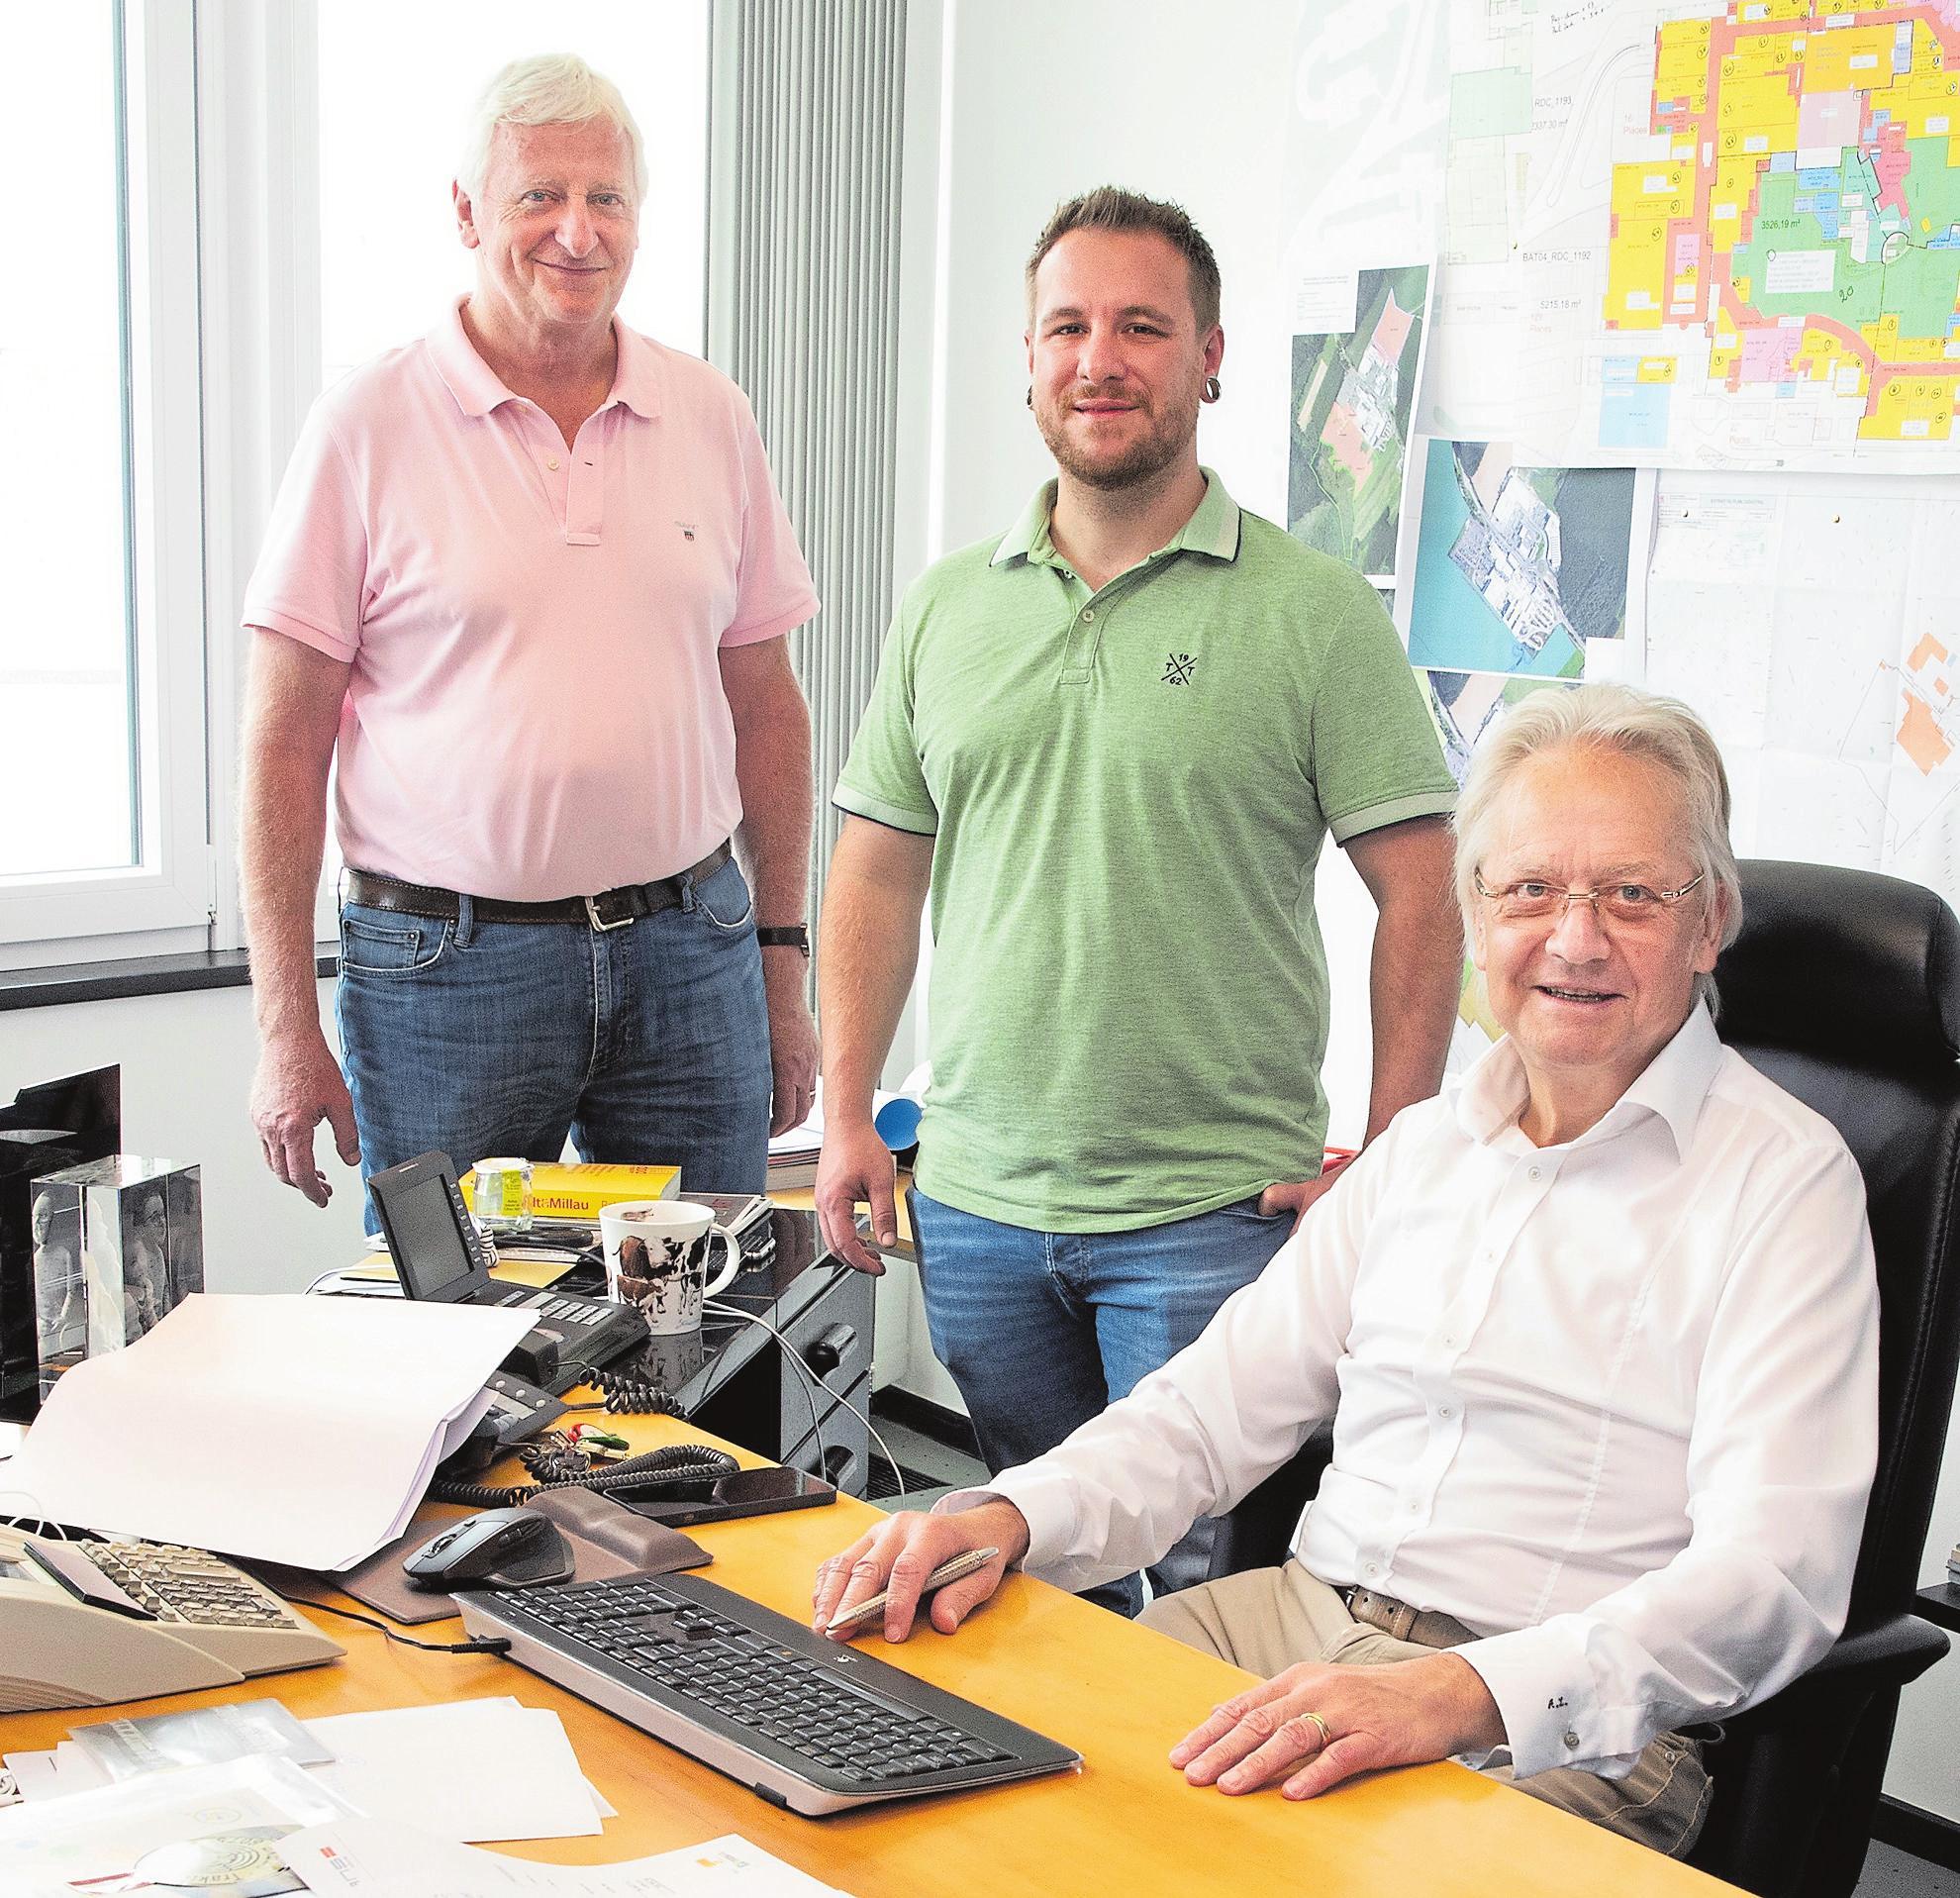 Die Geschäftsführung des Shopping Centers v.l.n.r.: Ed Goedert, Gilles & Arsène Laplume. Steve Eastwood